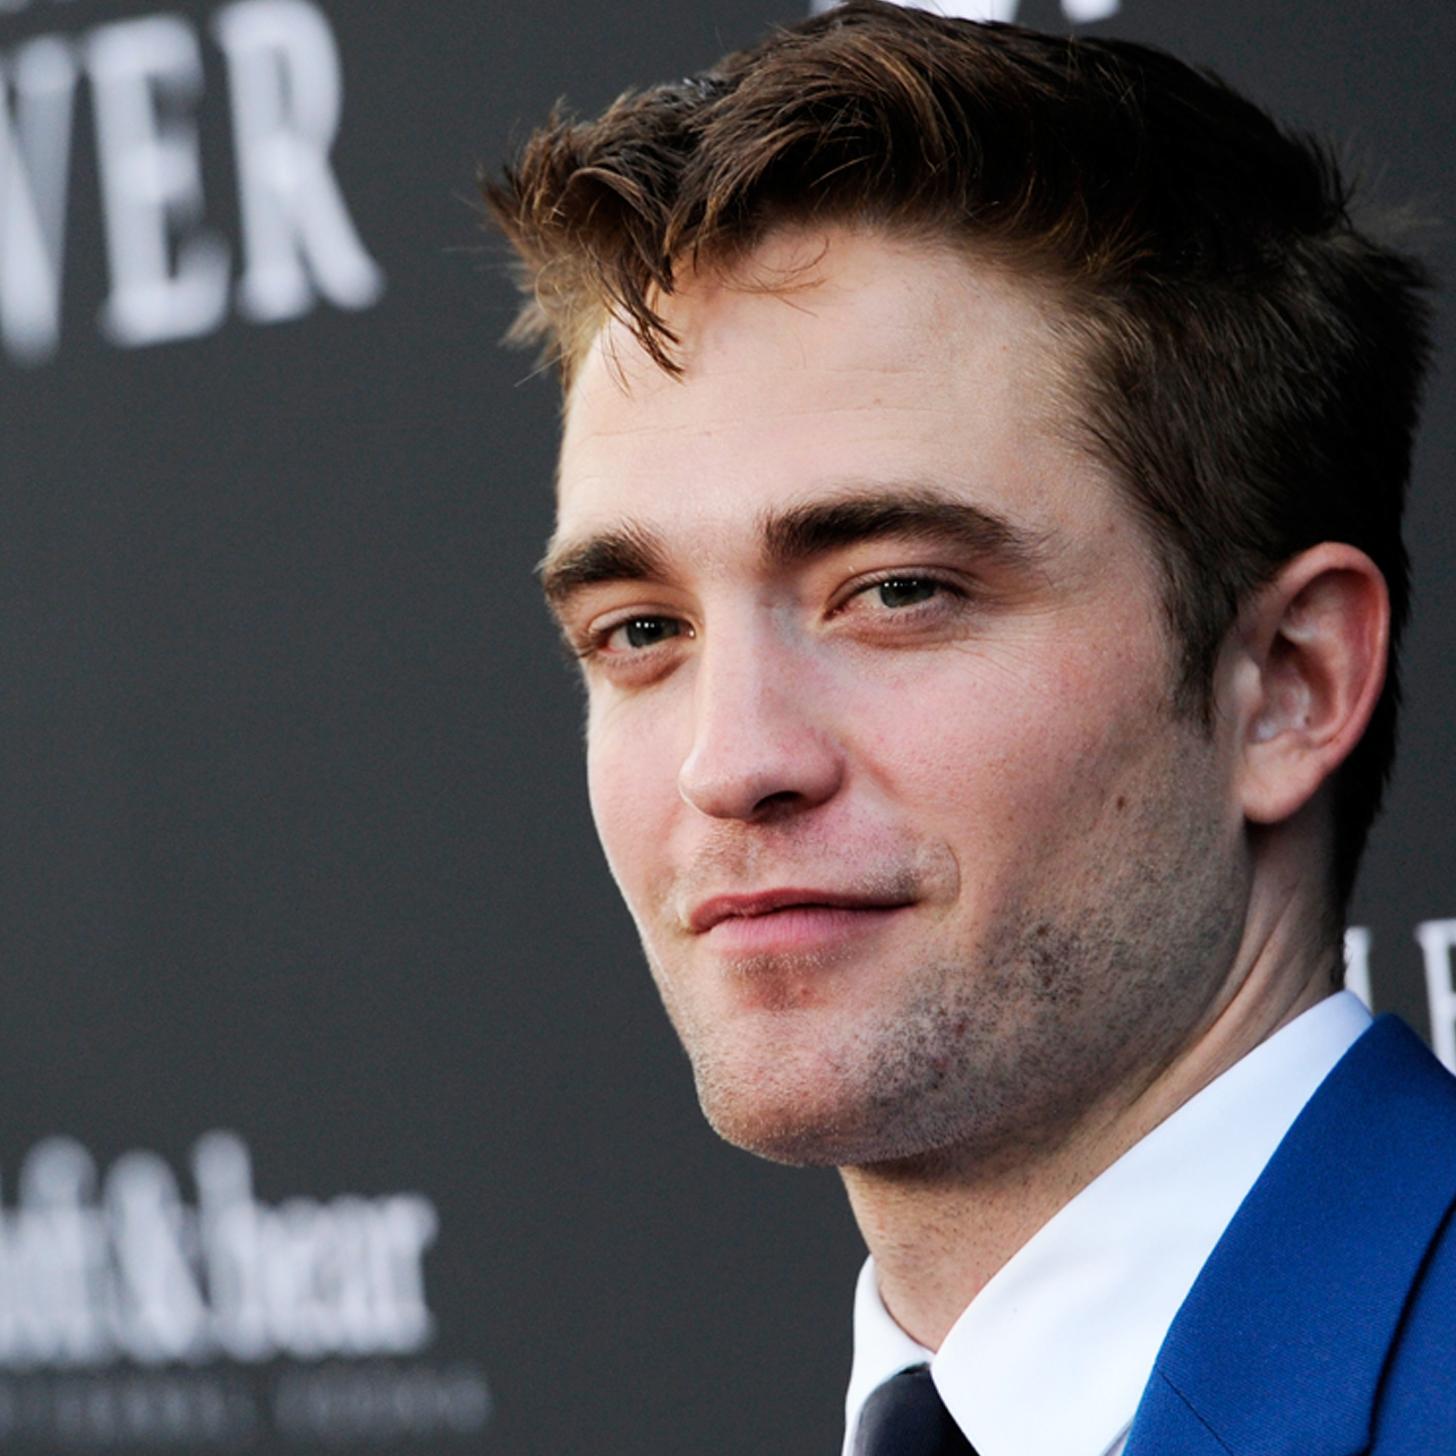 Robert Pattinson: Robert Pattinson Career News